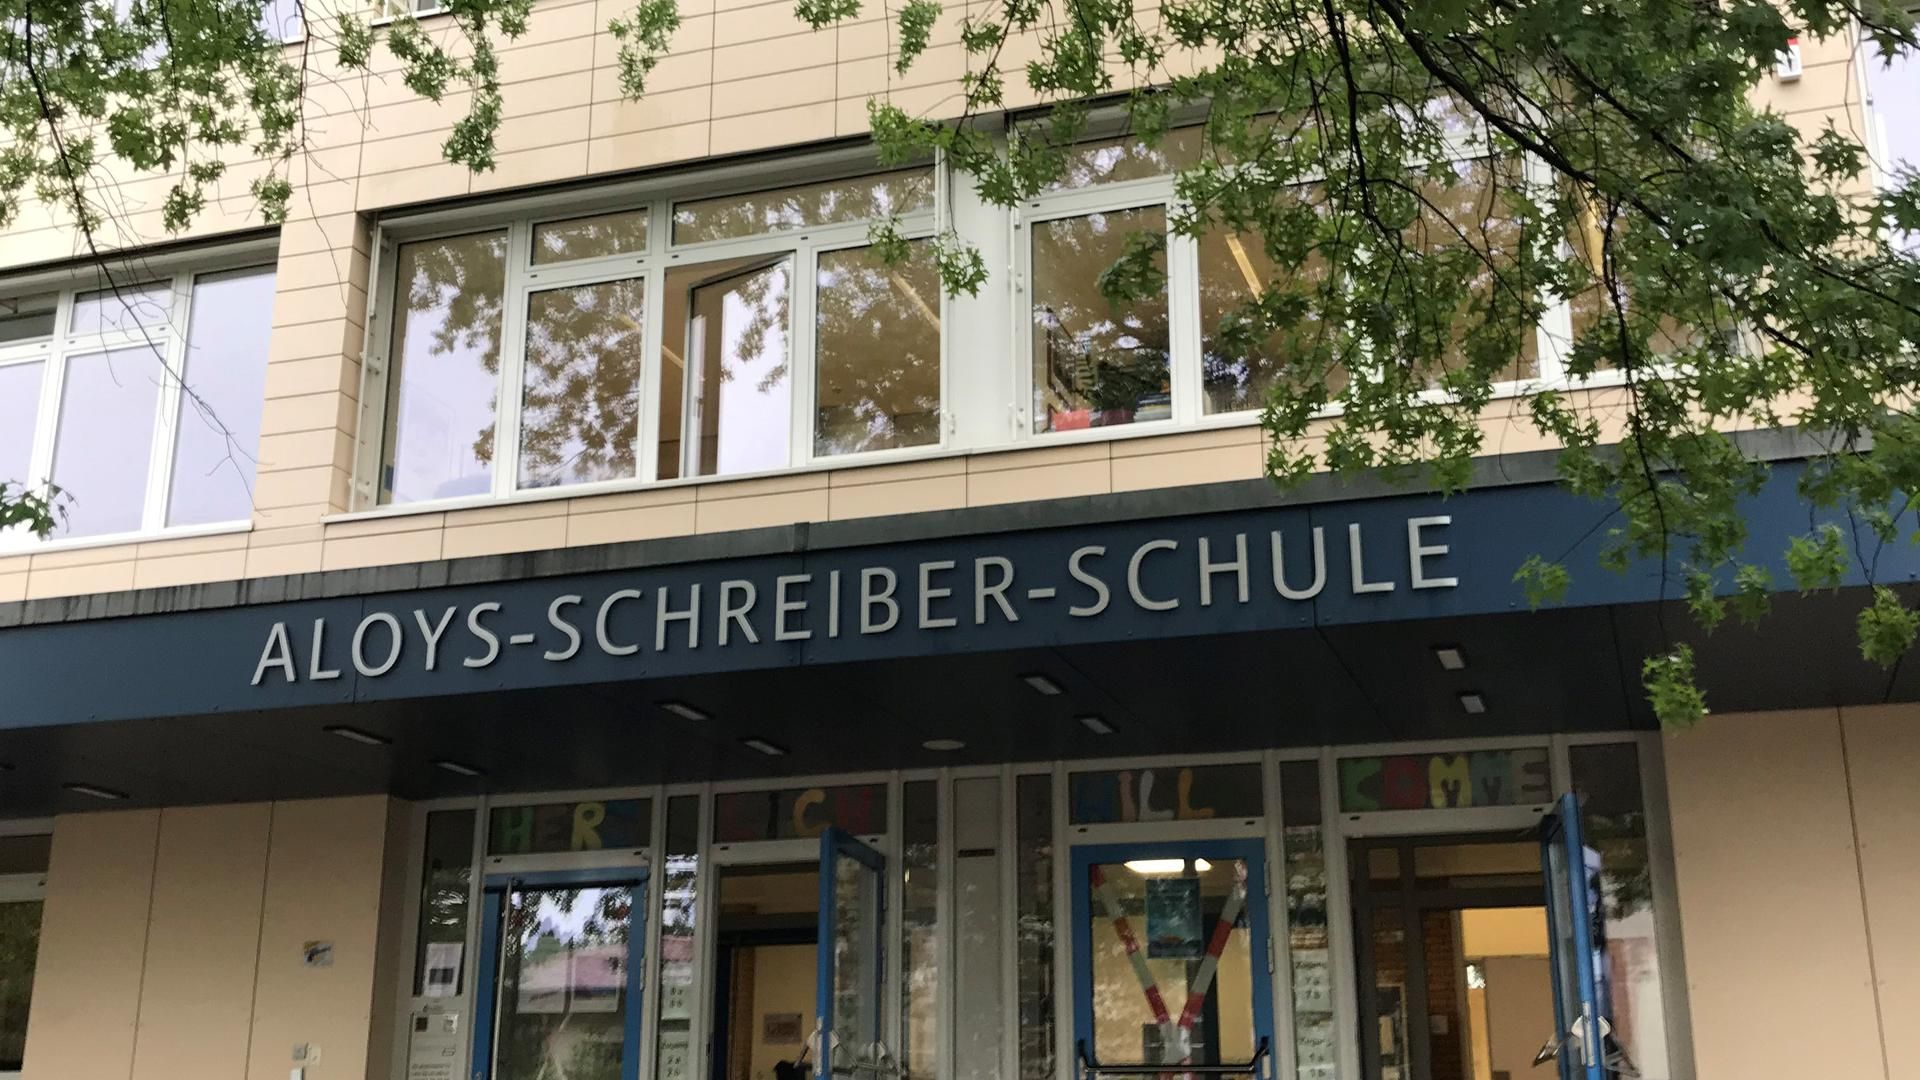 Aloys-Schreiber-Schule Bühl - Haupteingang